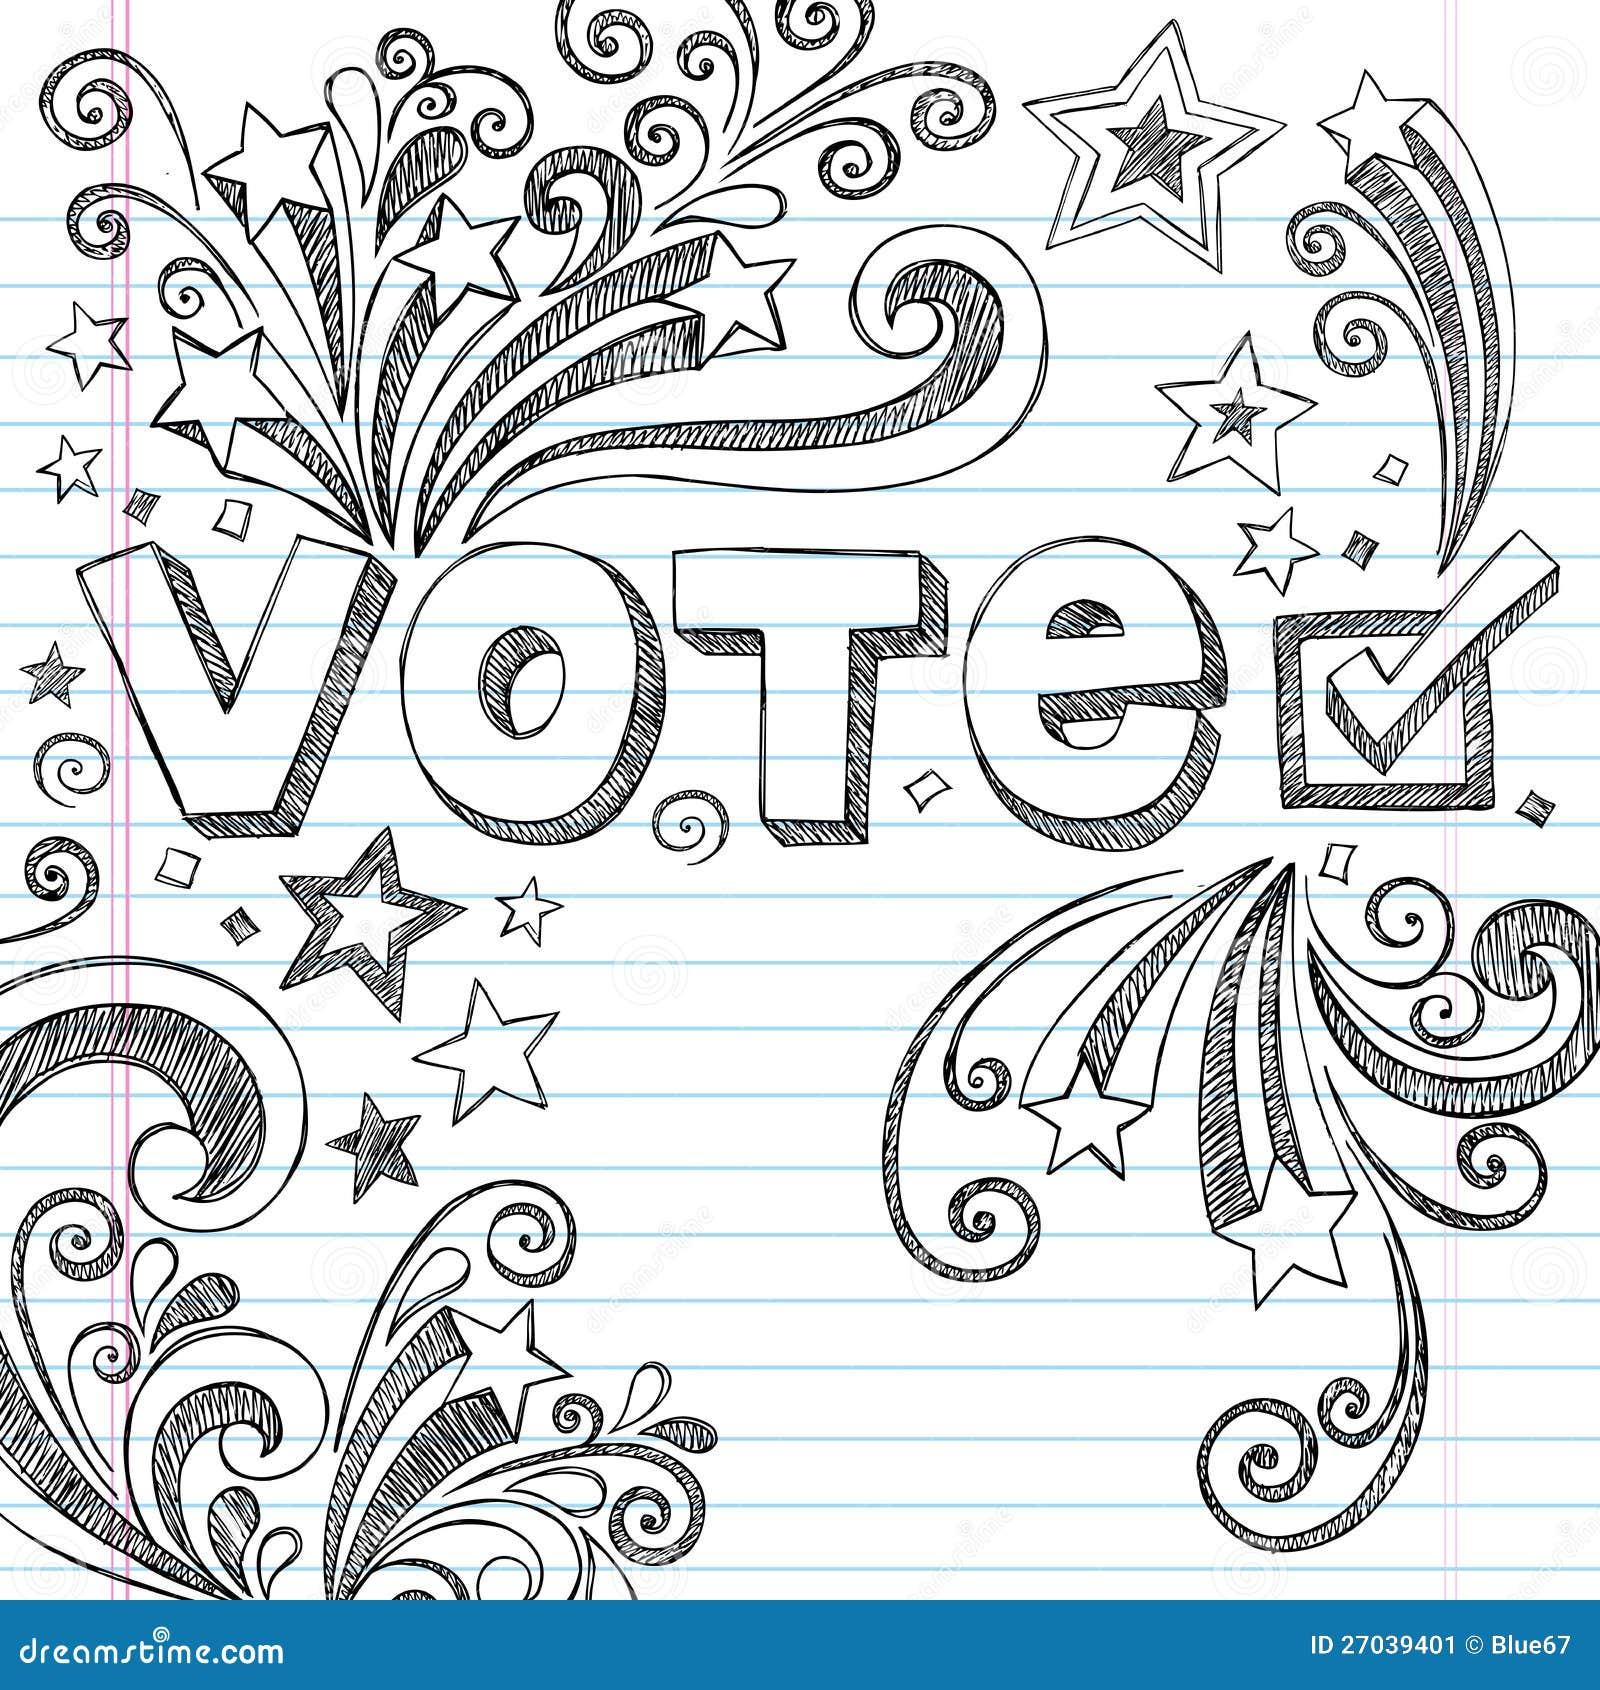 Vote Election Sketchy School Doodles Vector Illust